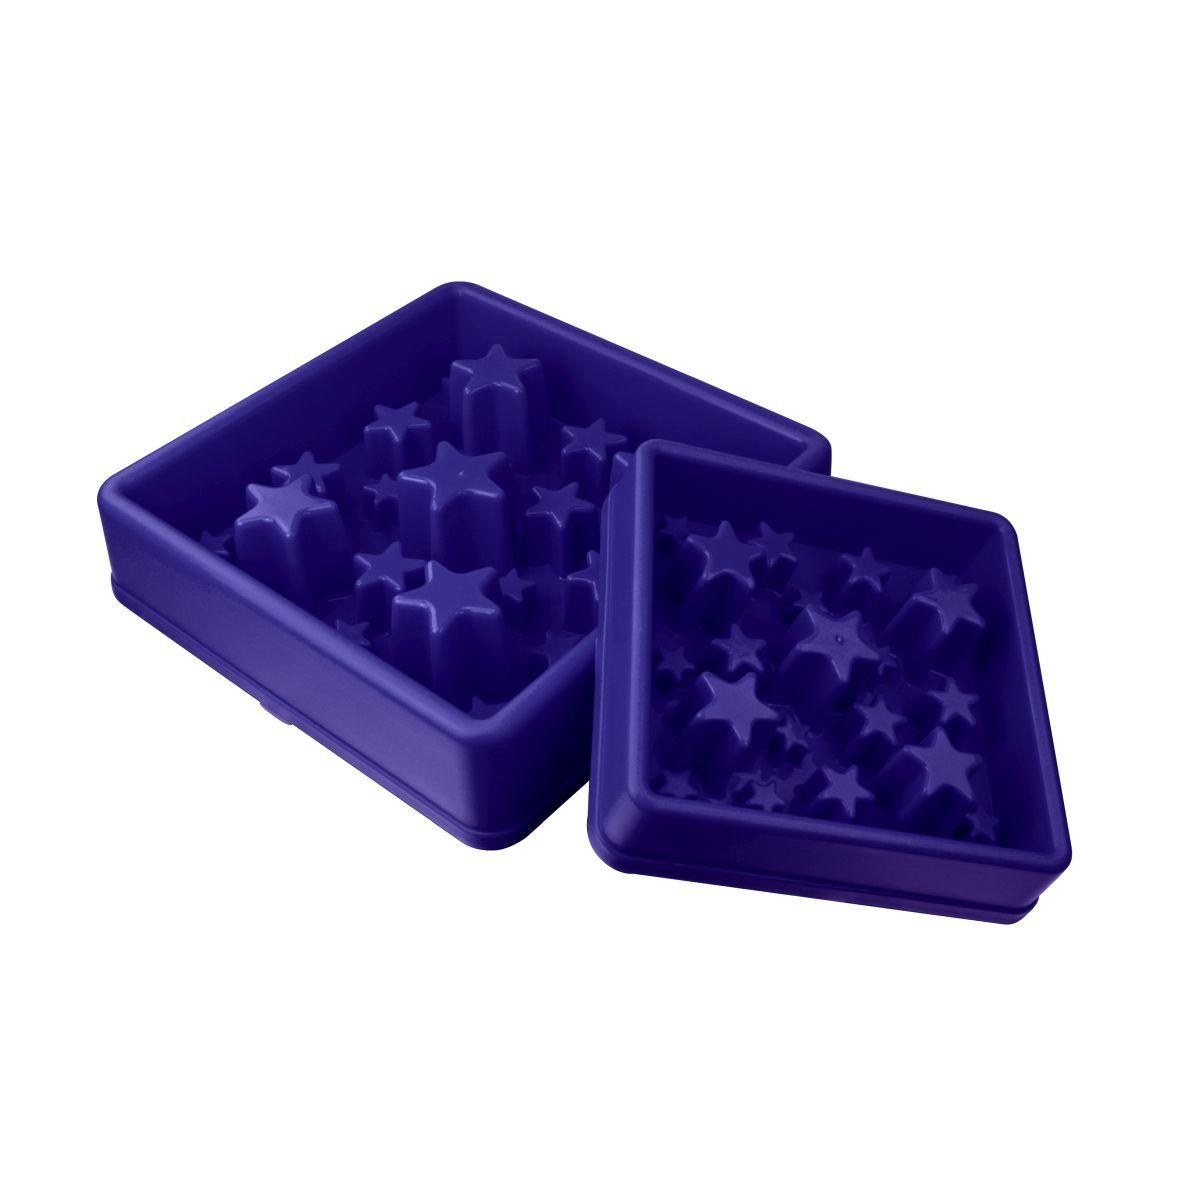 EAT SLOW STAR BLAUW L N 00001